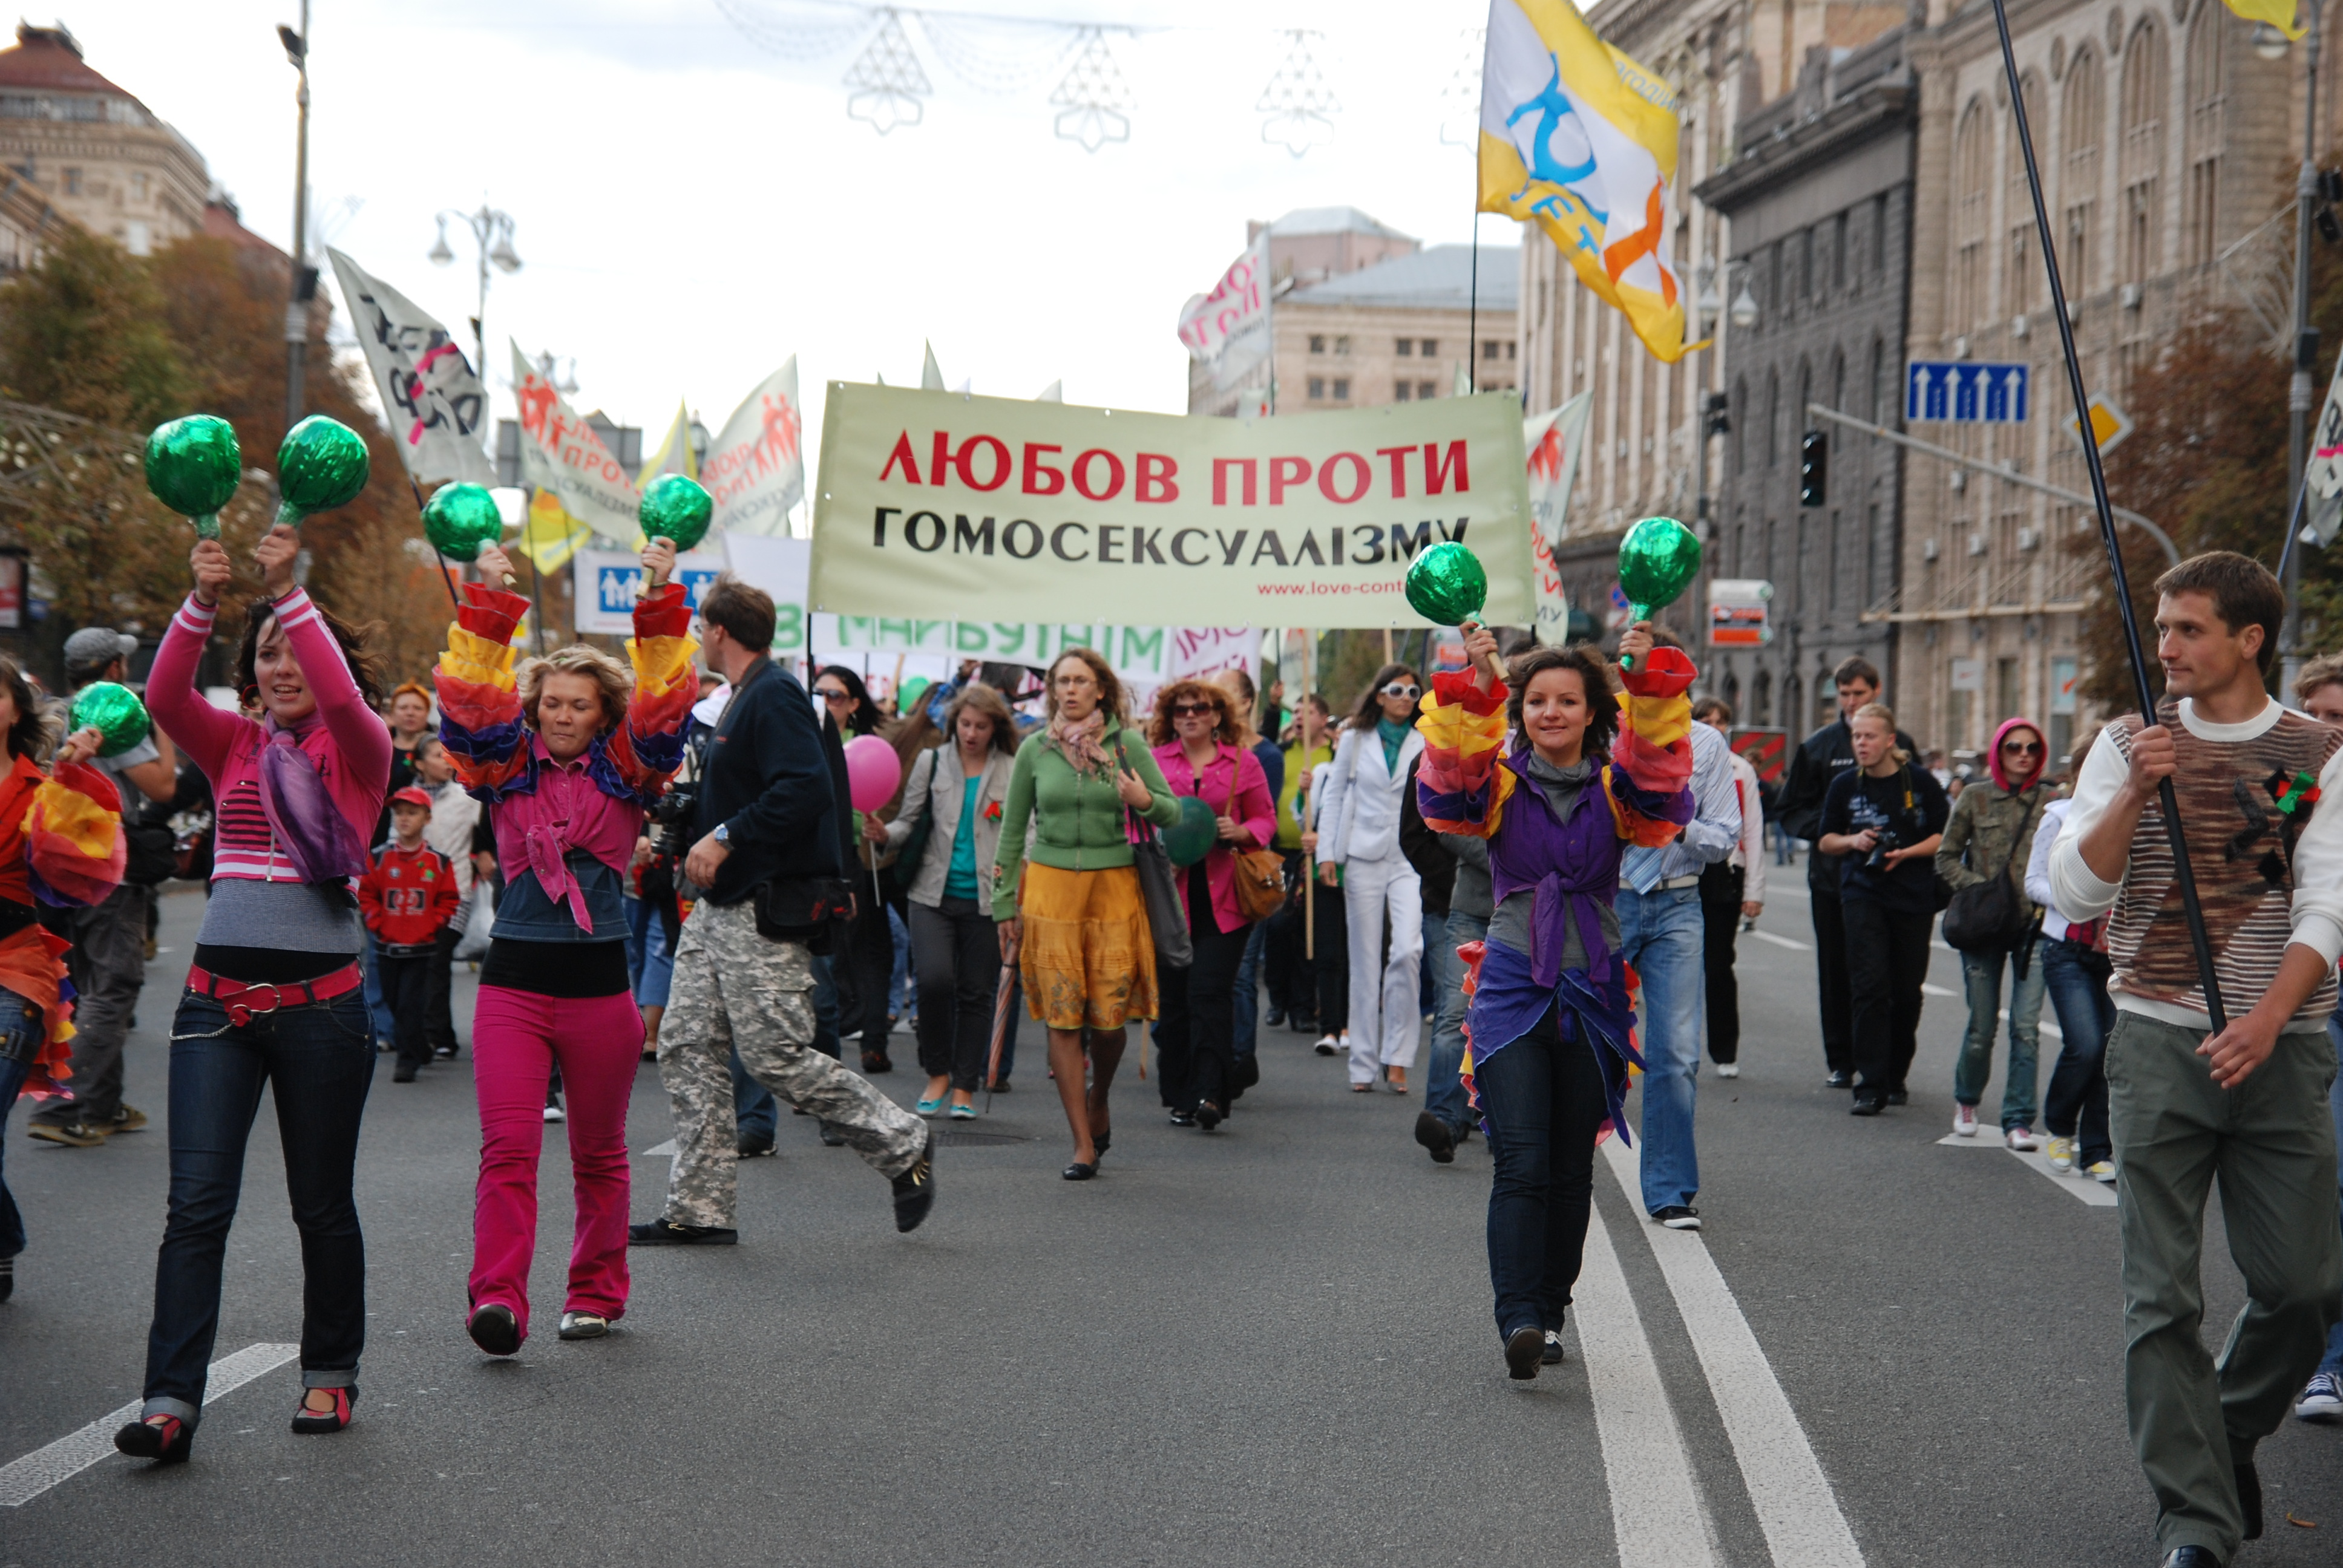 rossiya-protiv-geev